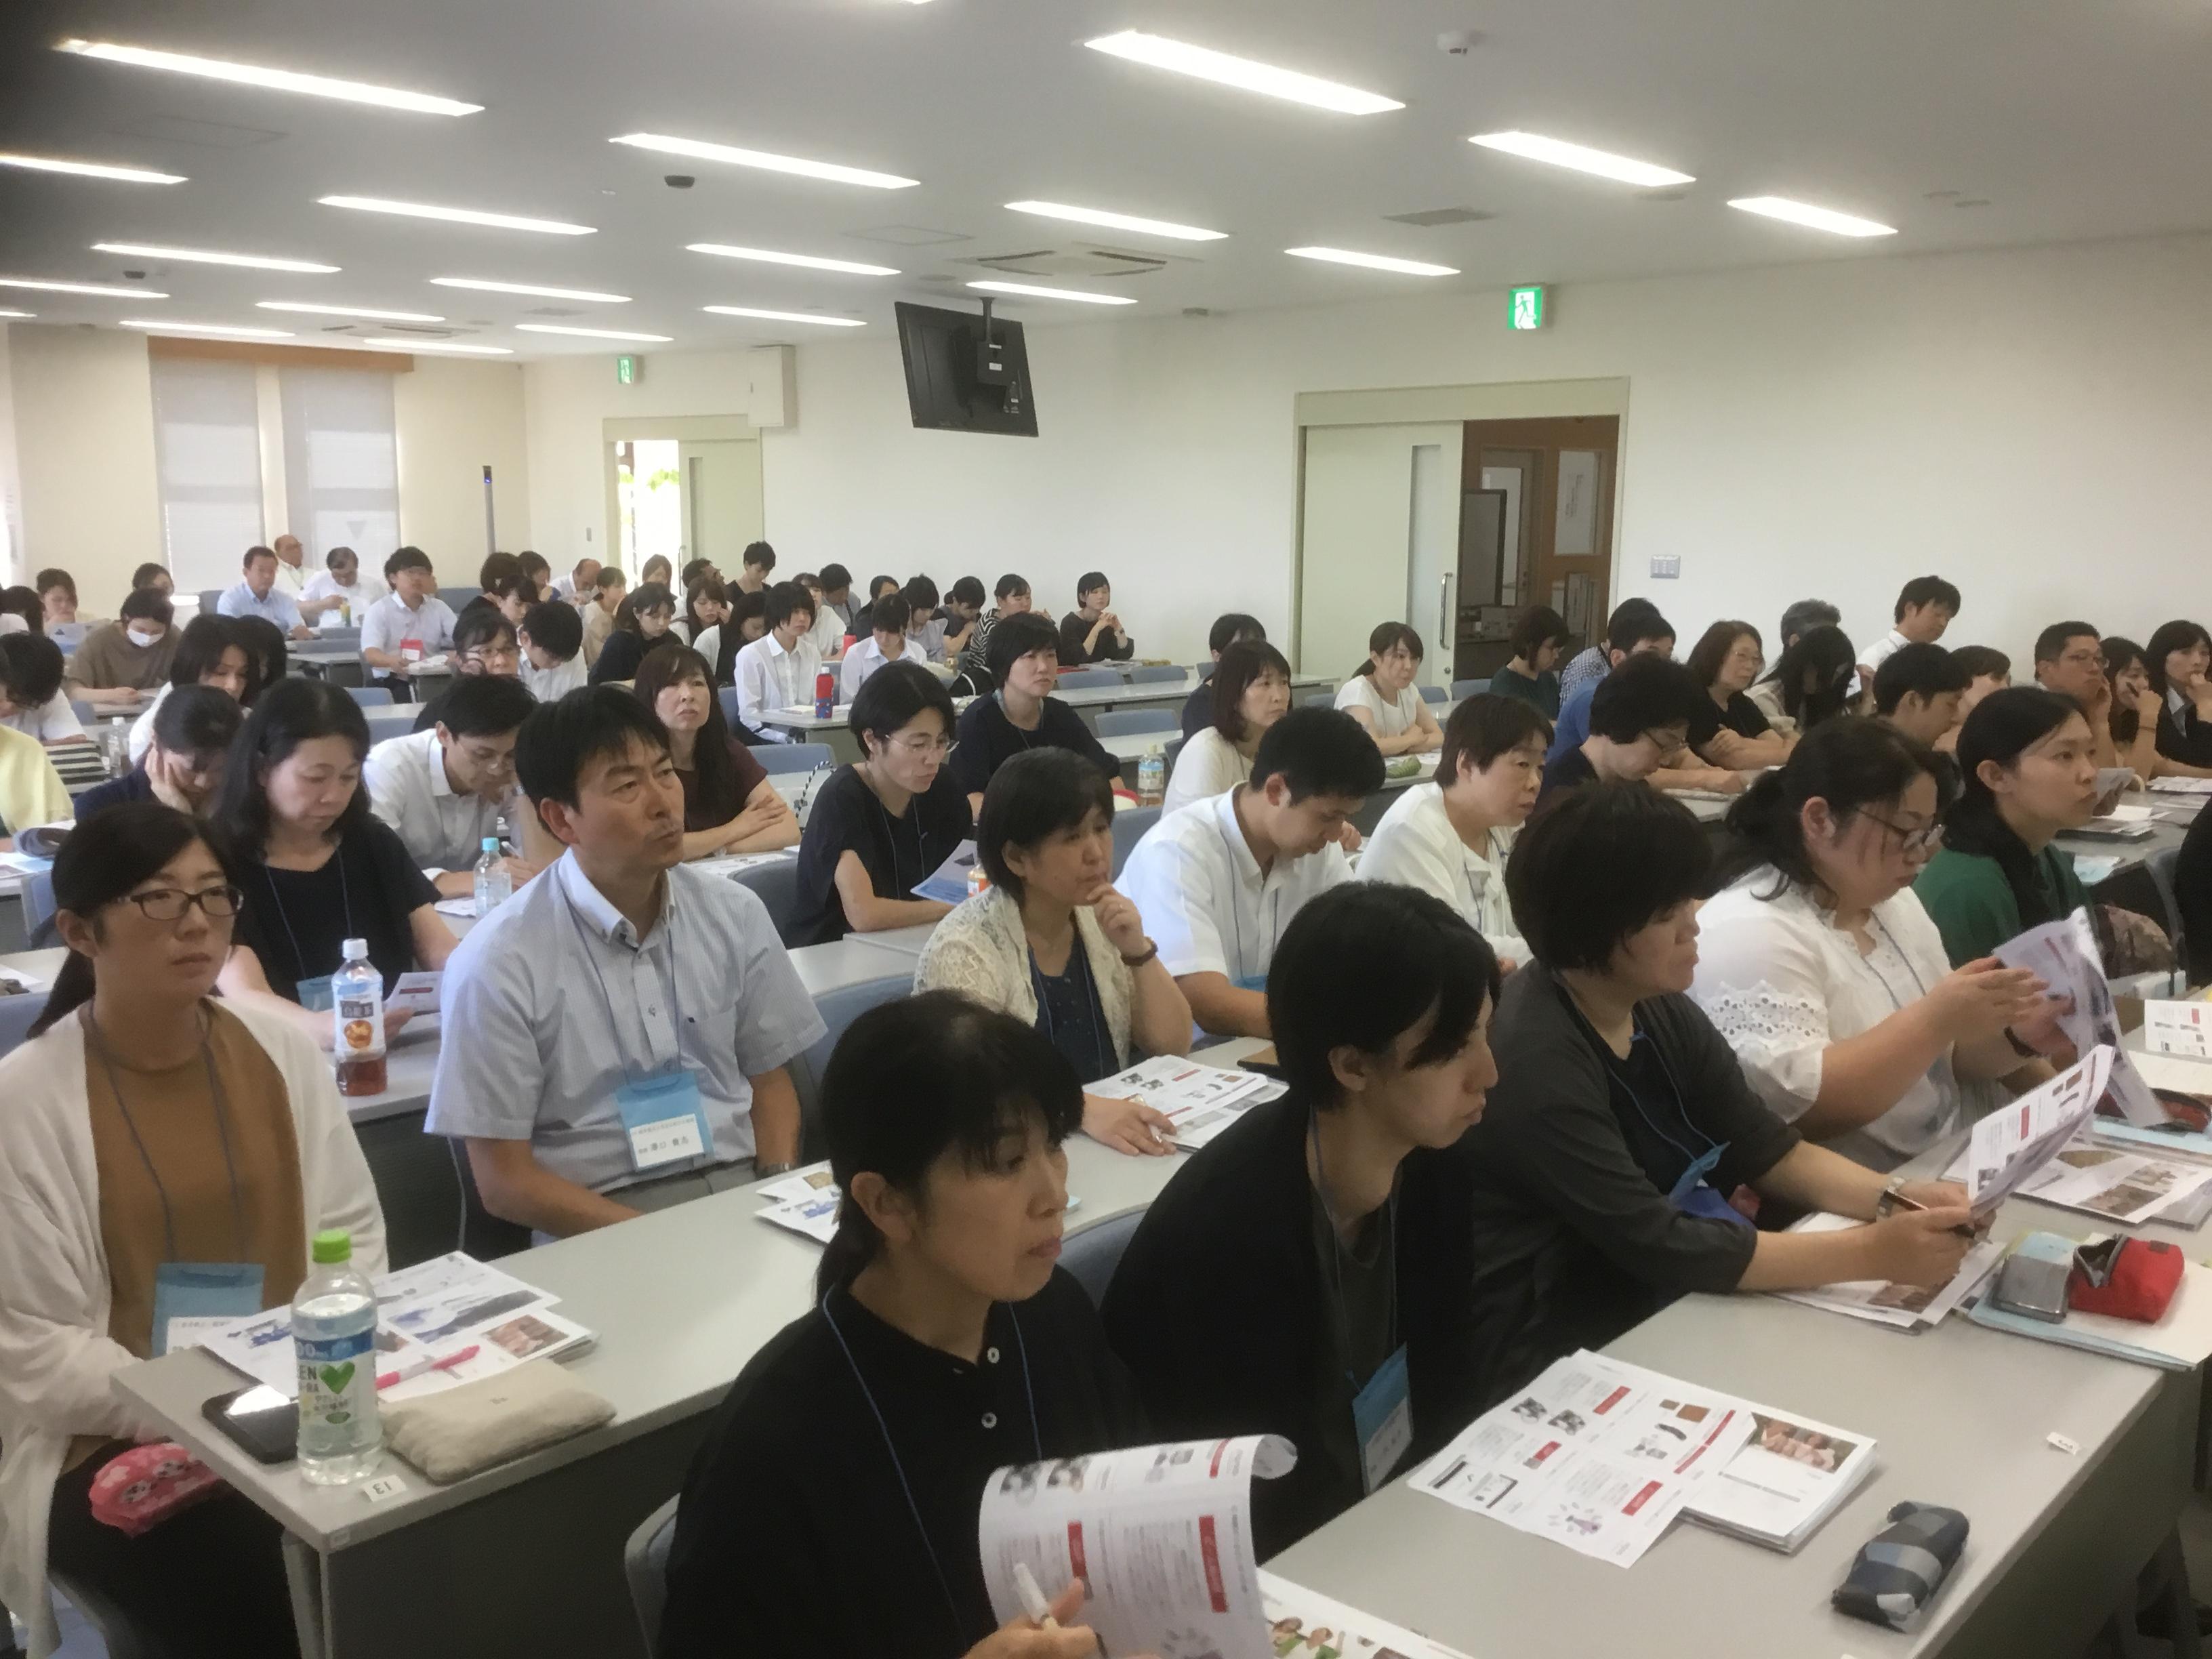 http://tooken.arrow.jp/blog/IMG_5161.JPG